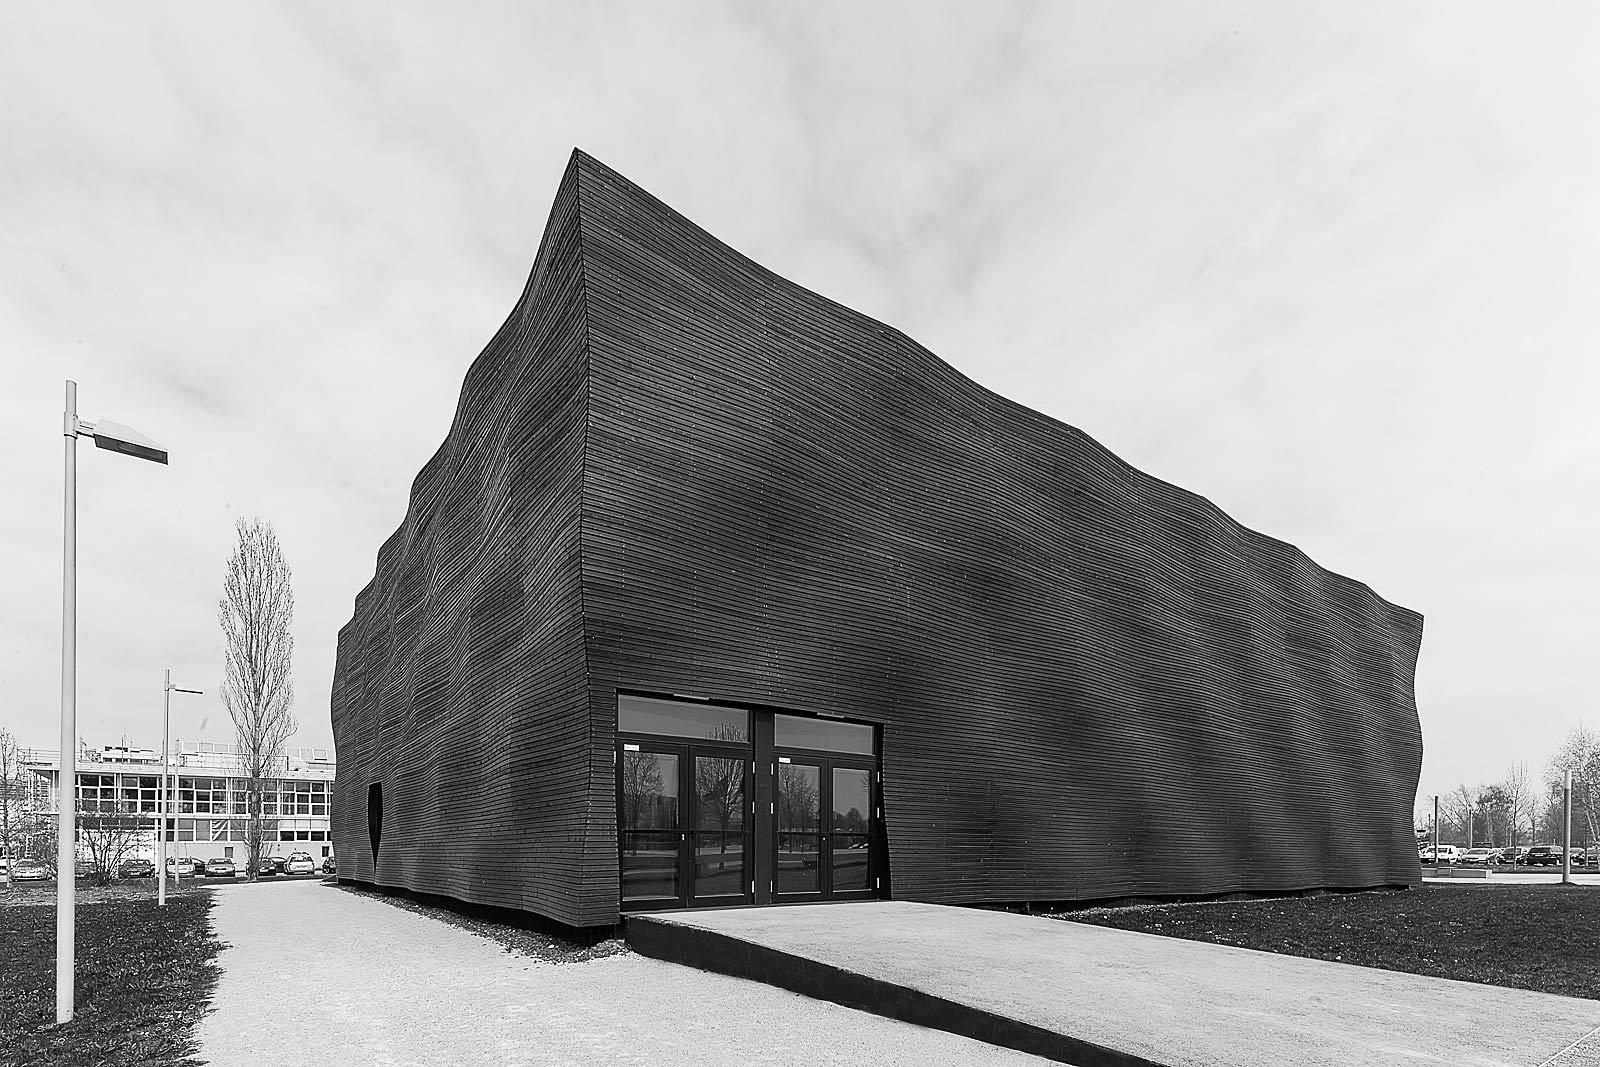 Architektur Aufnahme Interims Campus - freie Arbeit -1